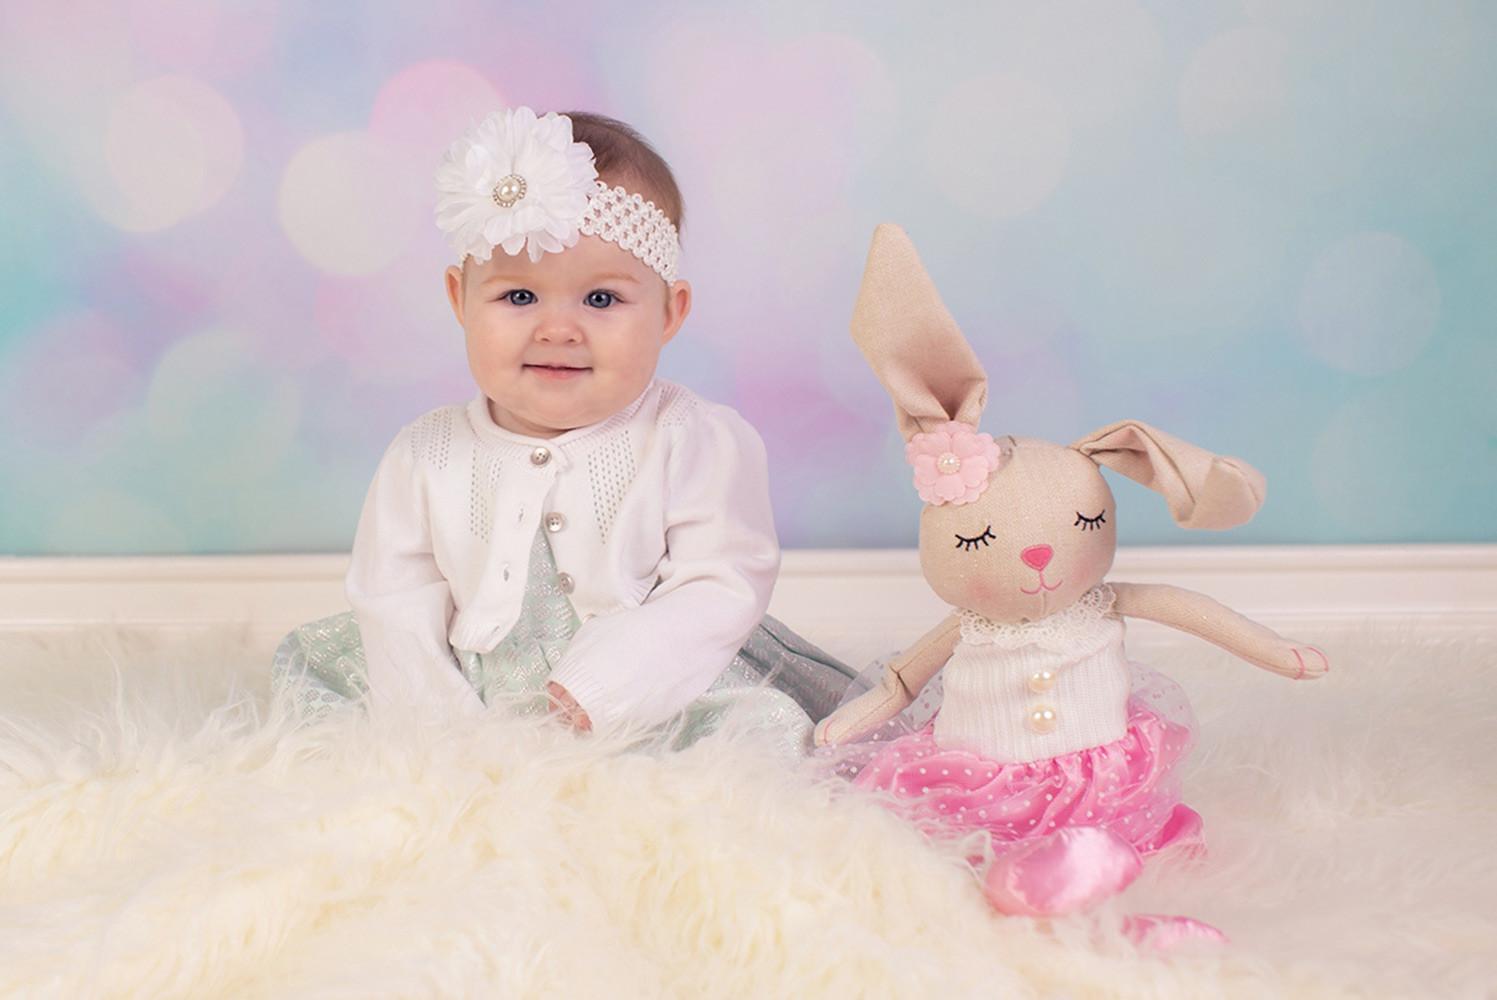 Easter baby photos